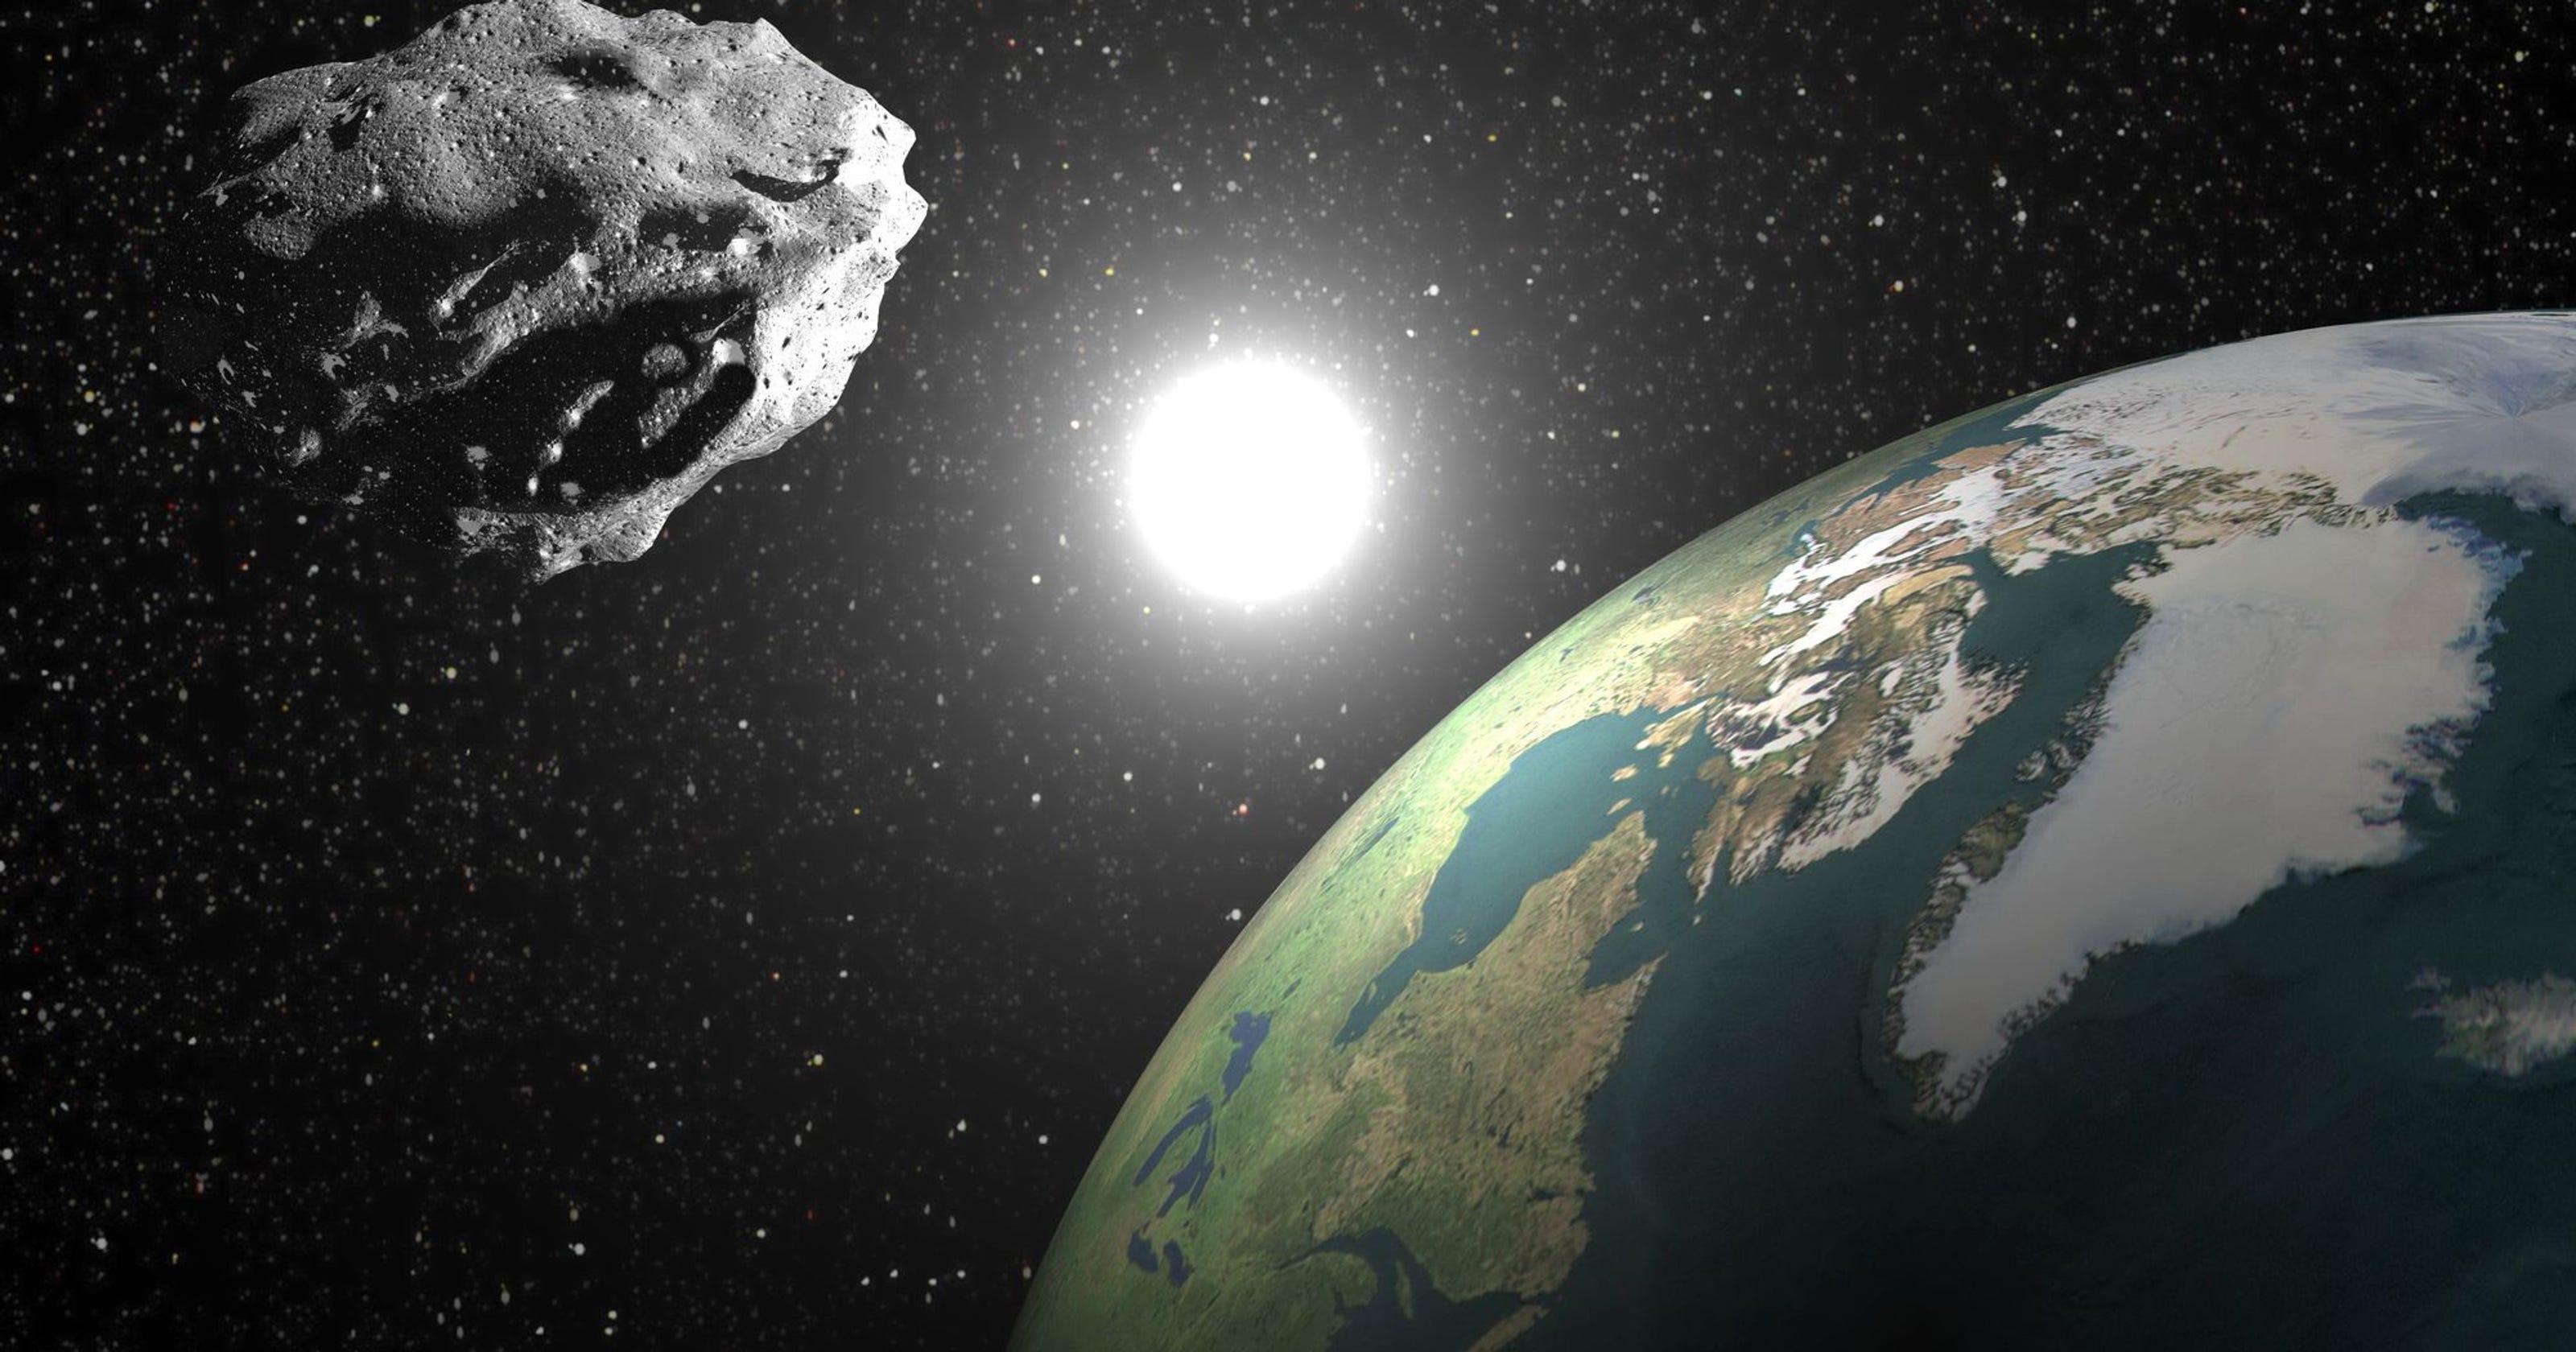 Пронесло! Астероид 2019 ОК пролетел мимо